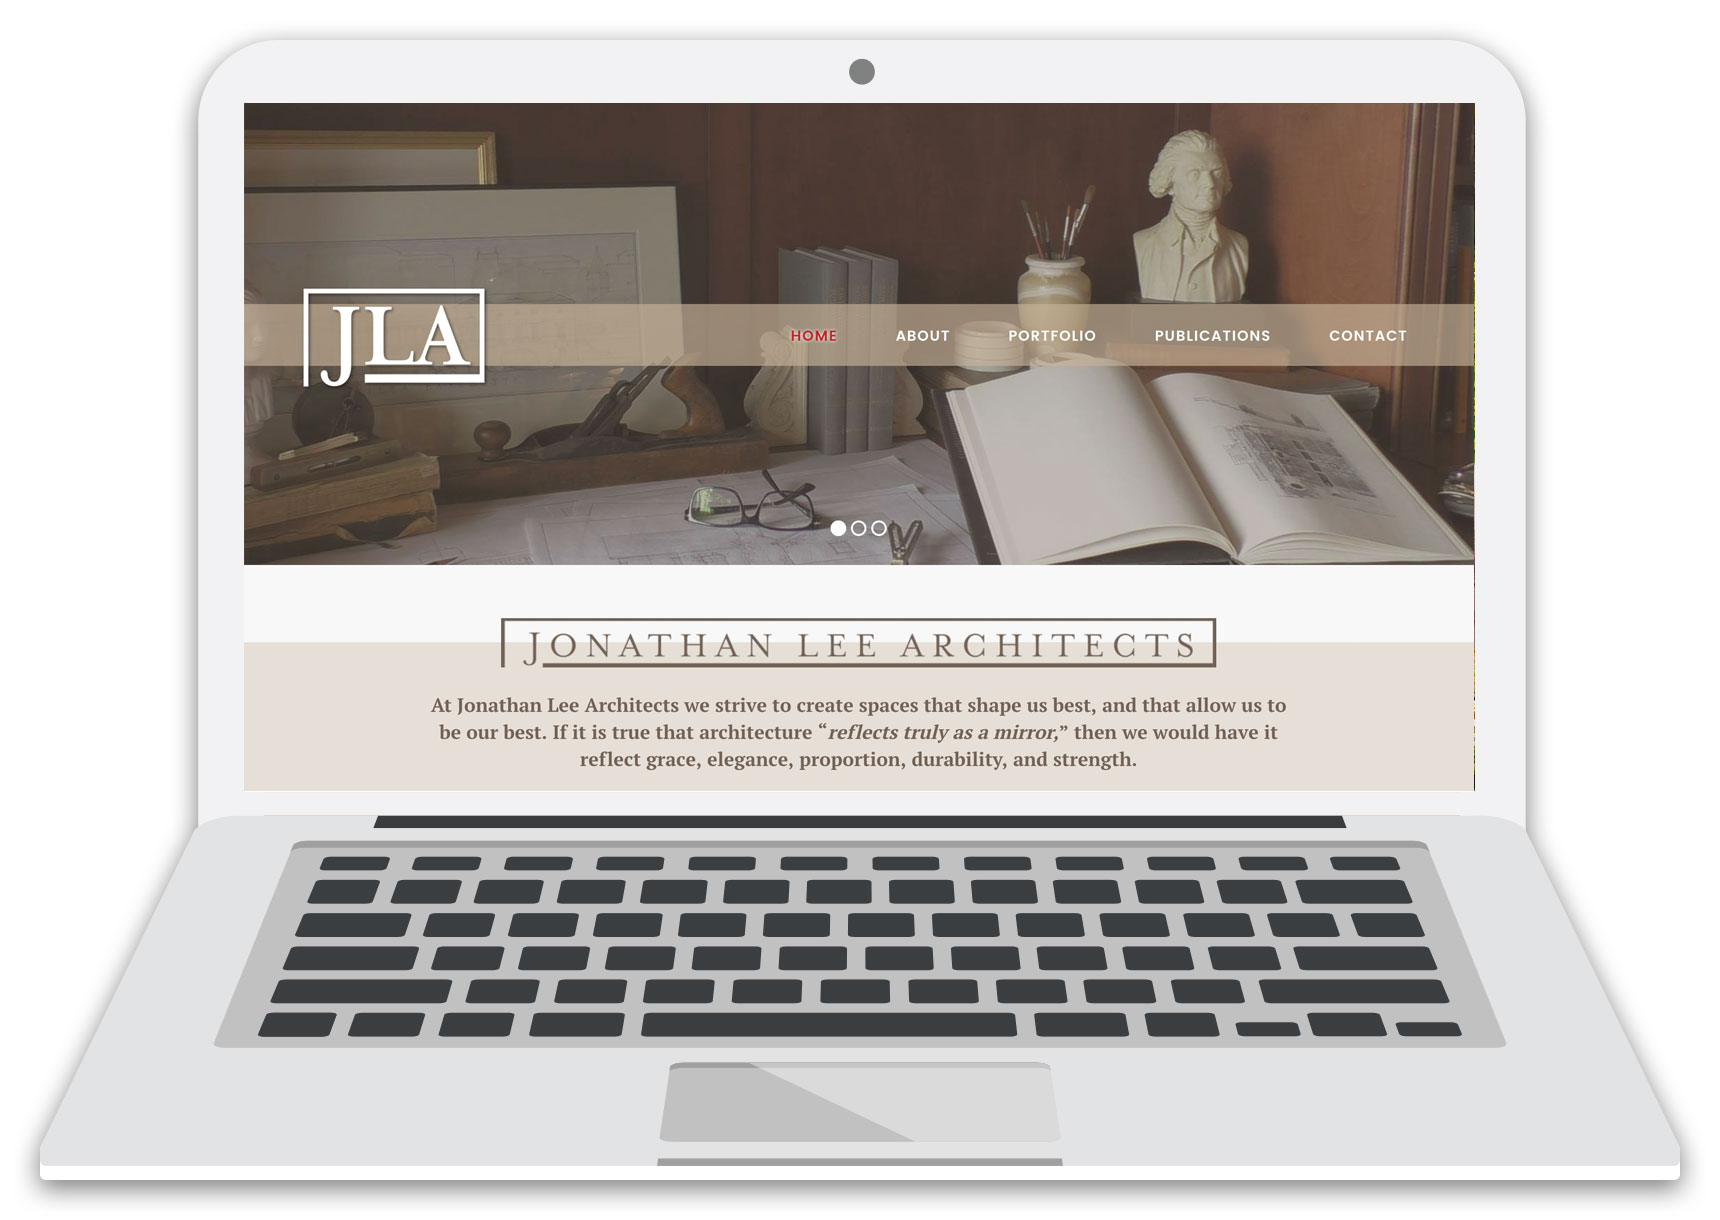 jonathan lee architects website laptop